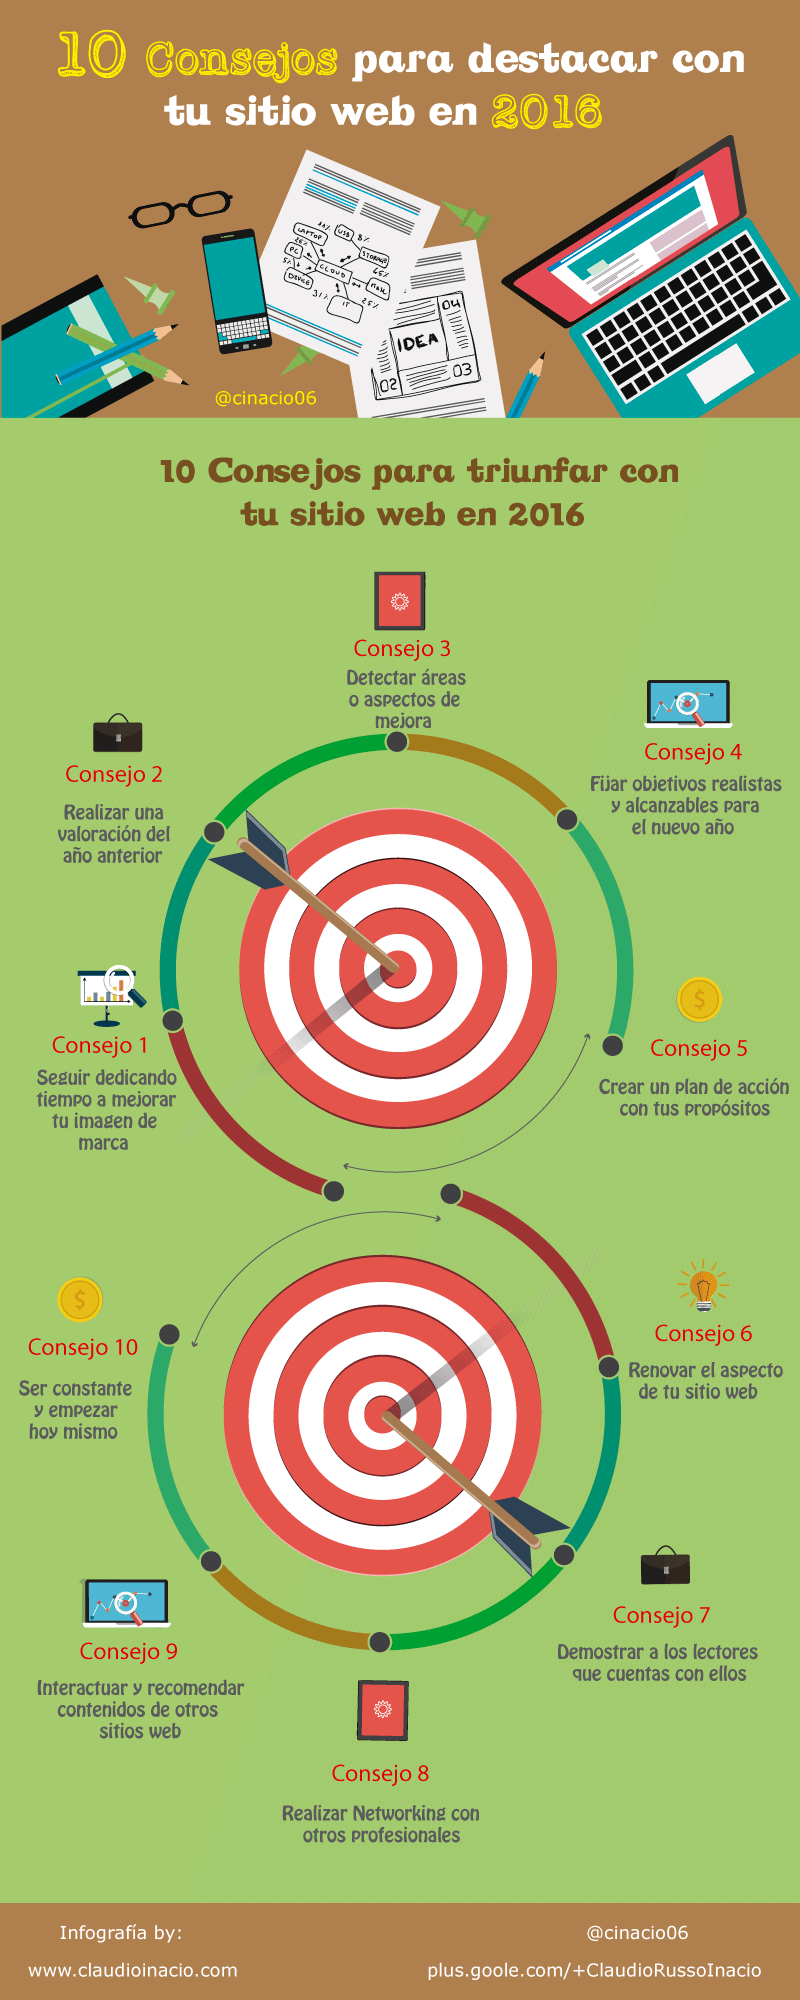 infografía con consejos para triunfar con tu sitio web en 2016